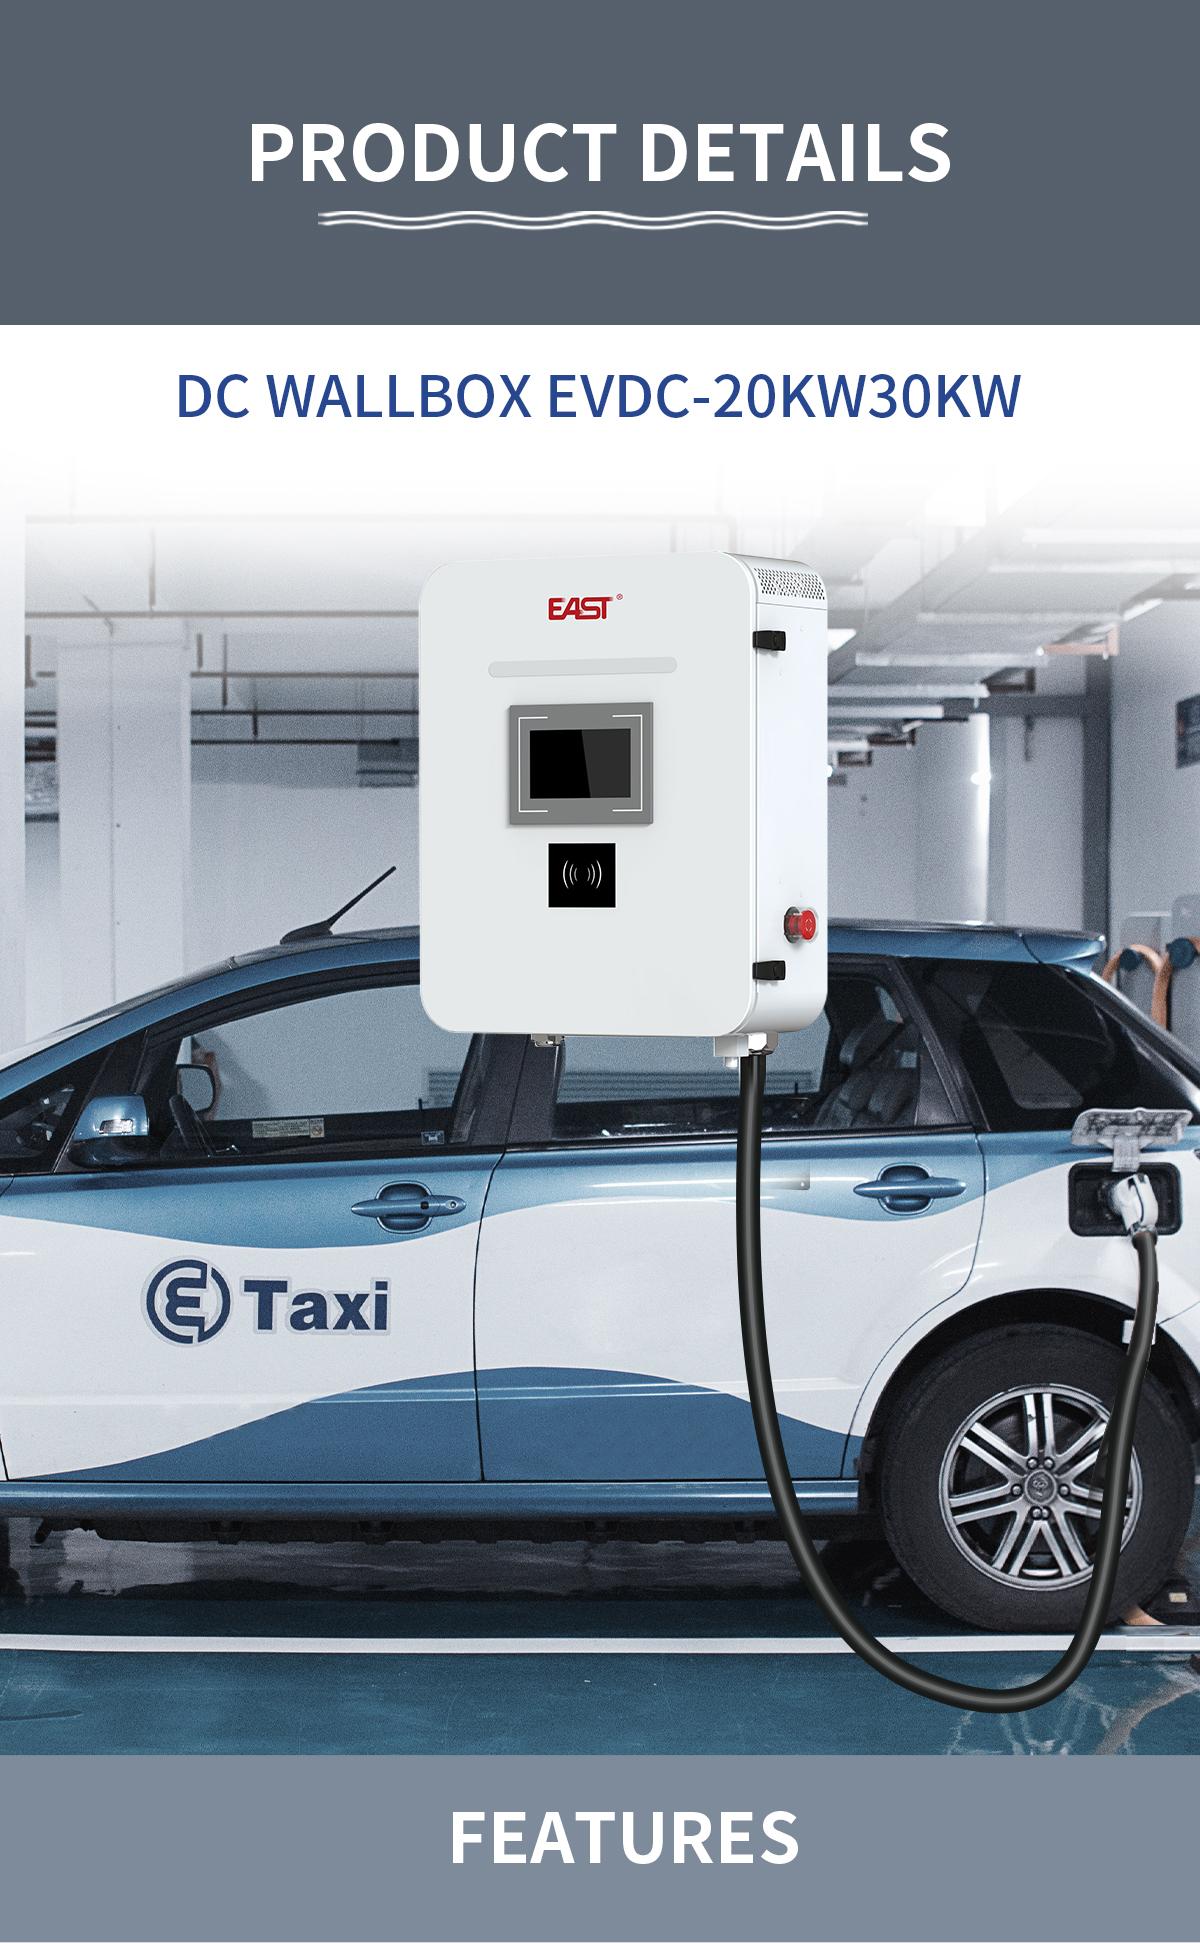 DC-Wallbox-EVDC-20kW30kW-(产品主图)_01(1).jpg